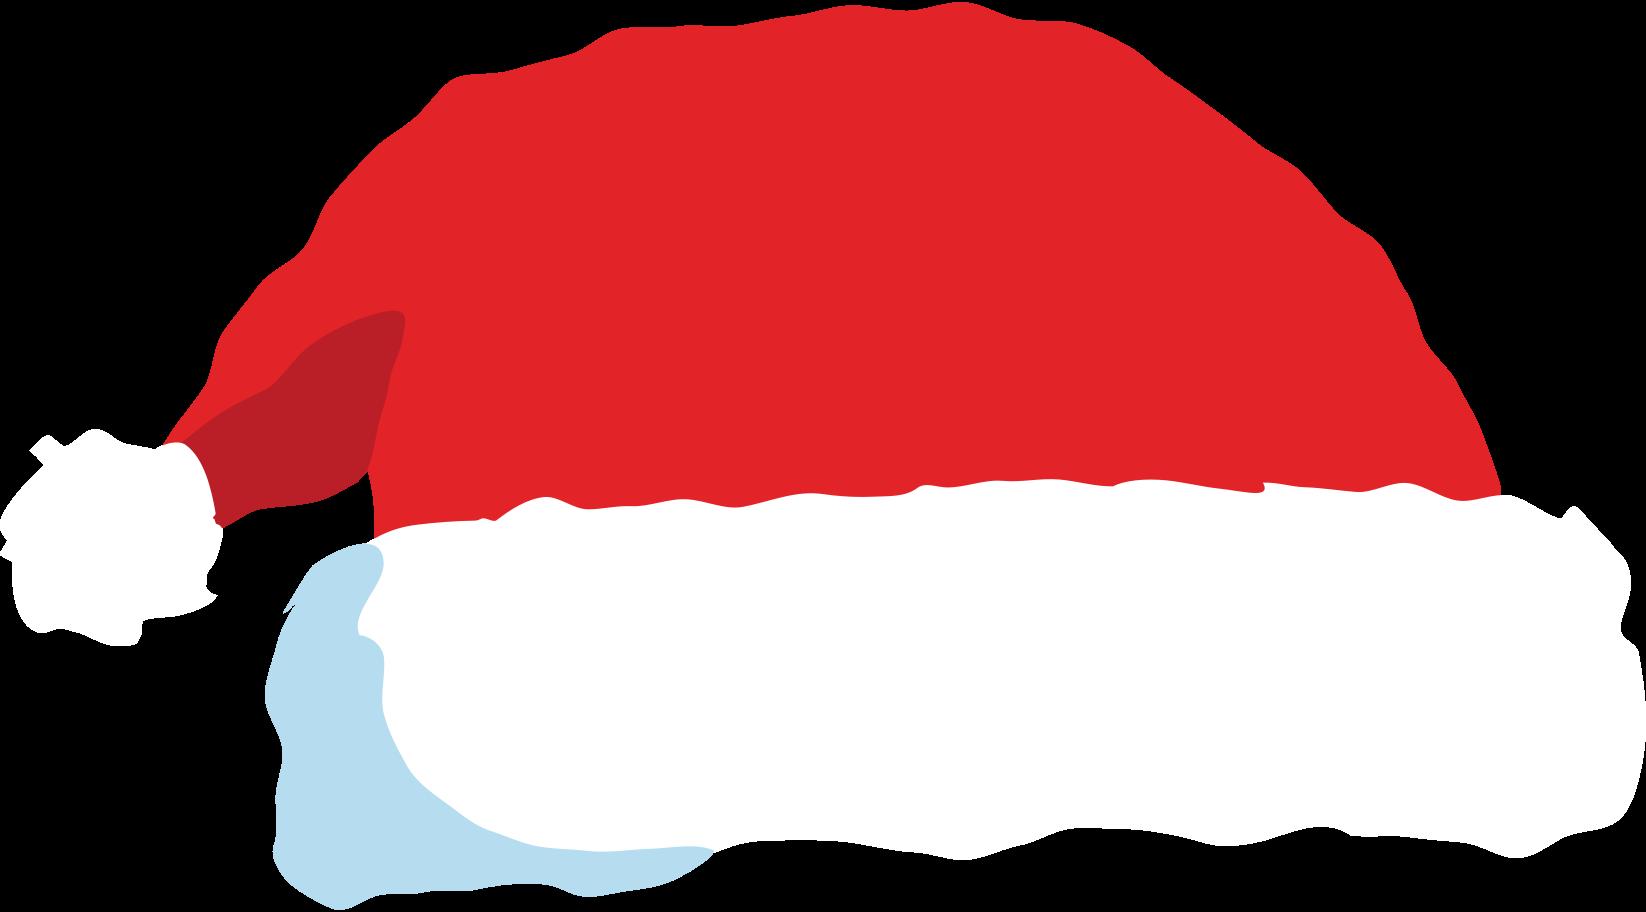 christmas hat side Clipart illustration in PNG, SVG